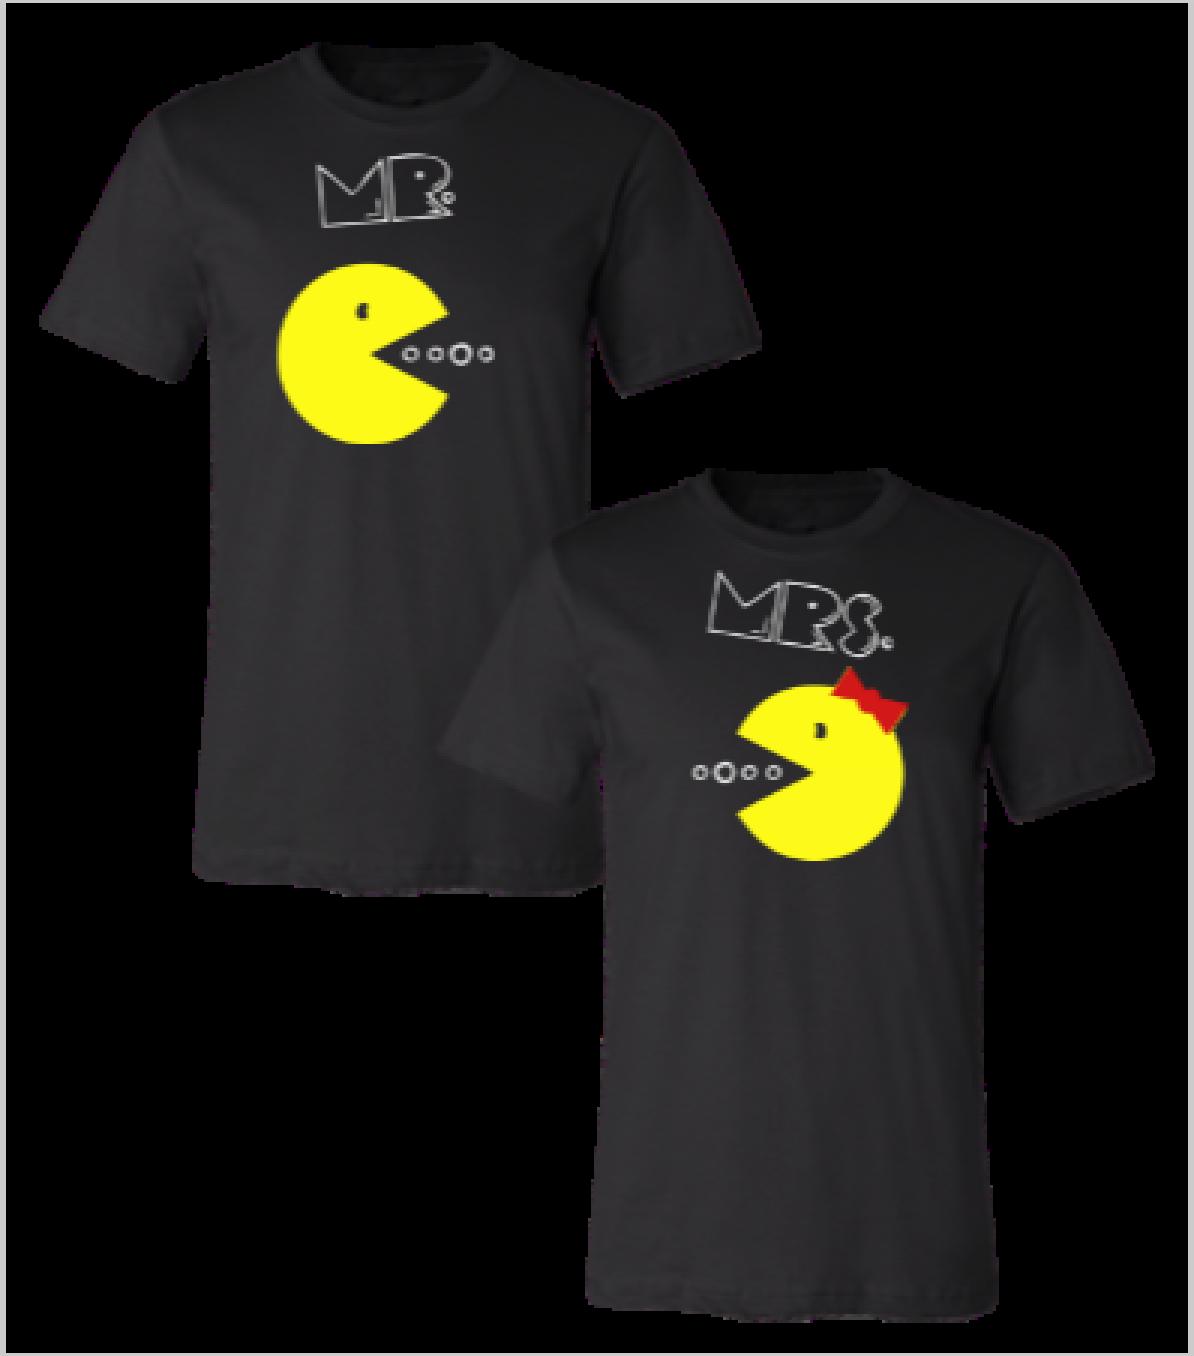 538d2da1aa0f pac man mr and mrs couple t-shirt